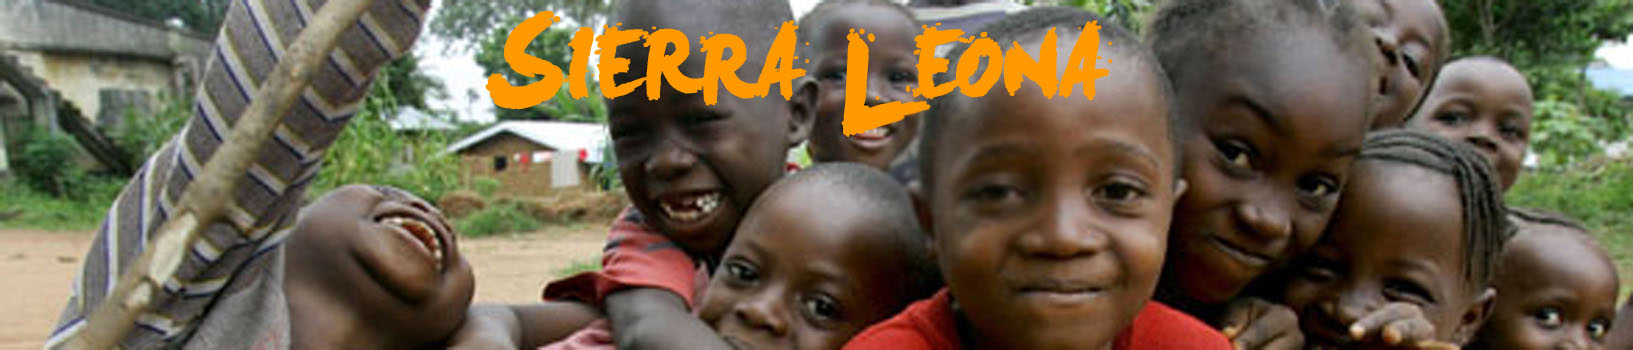 Viaje Sierra Leona. Cultura Africana y Viajes